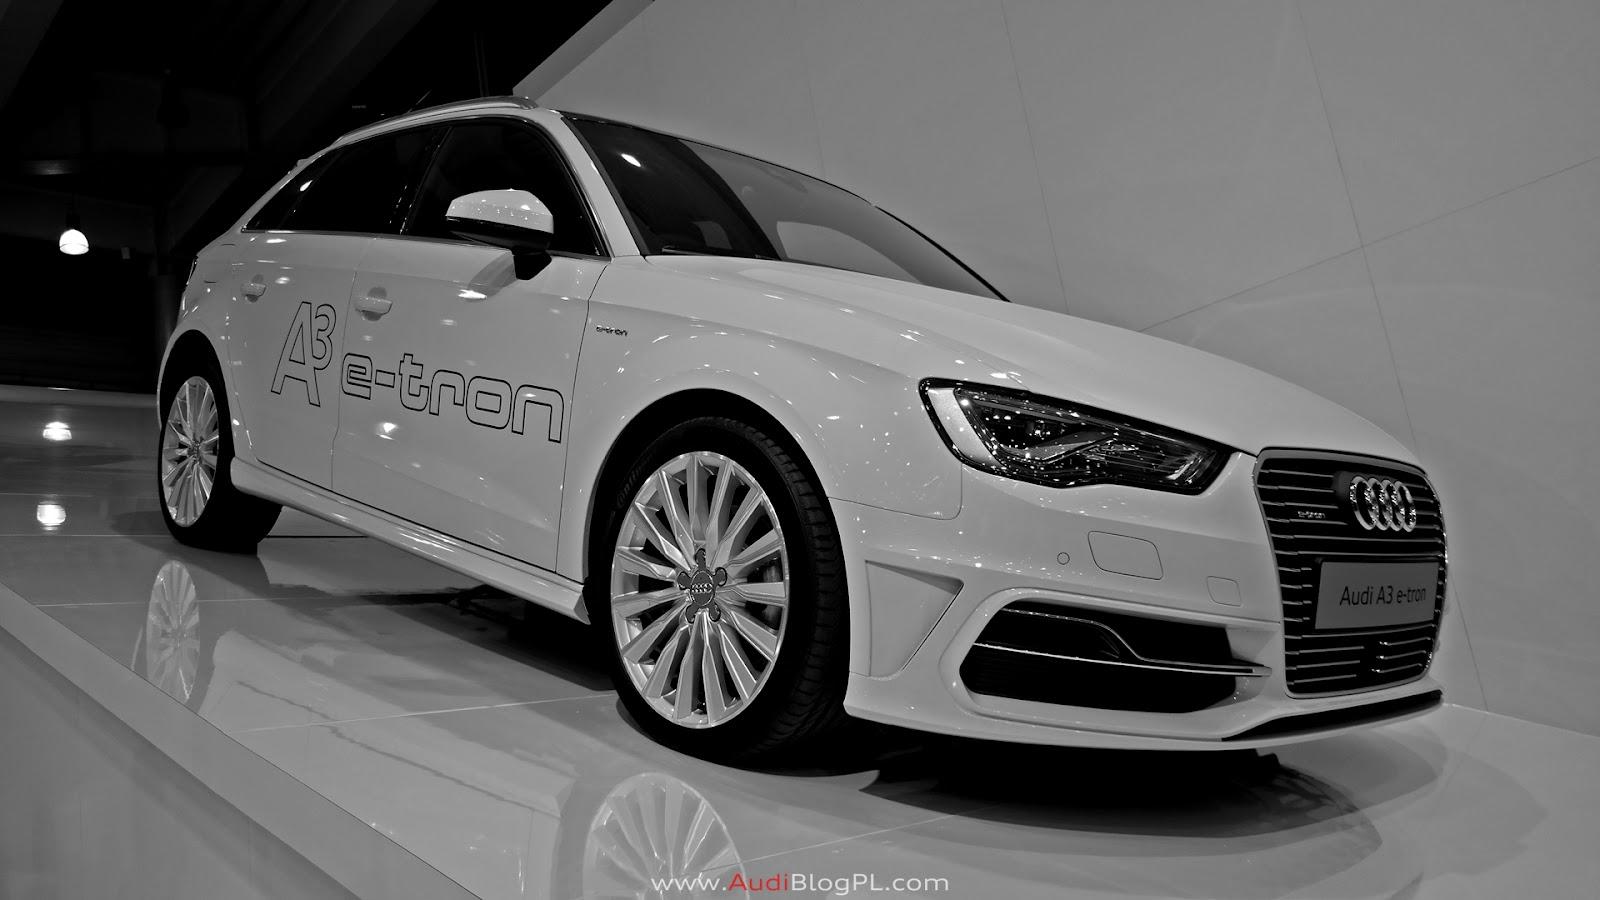 Audi A3 e-tron 8V